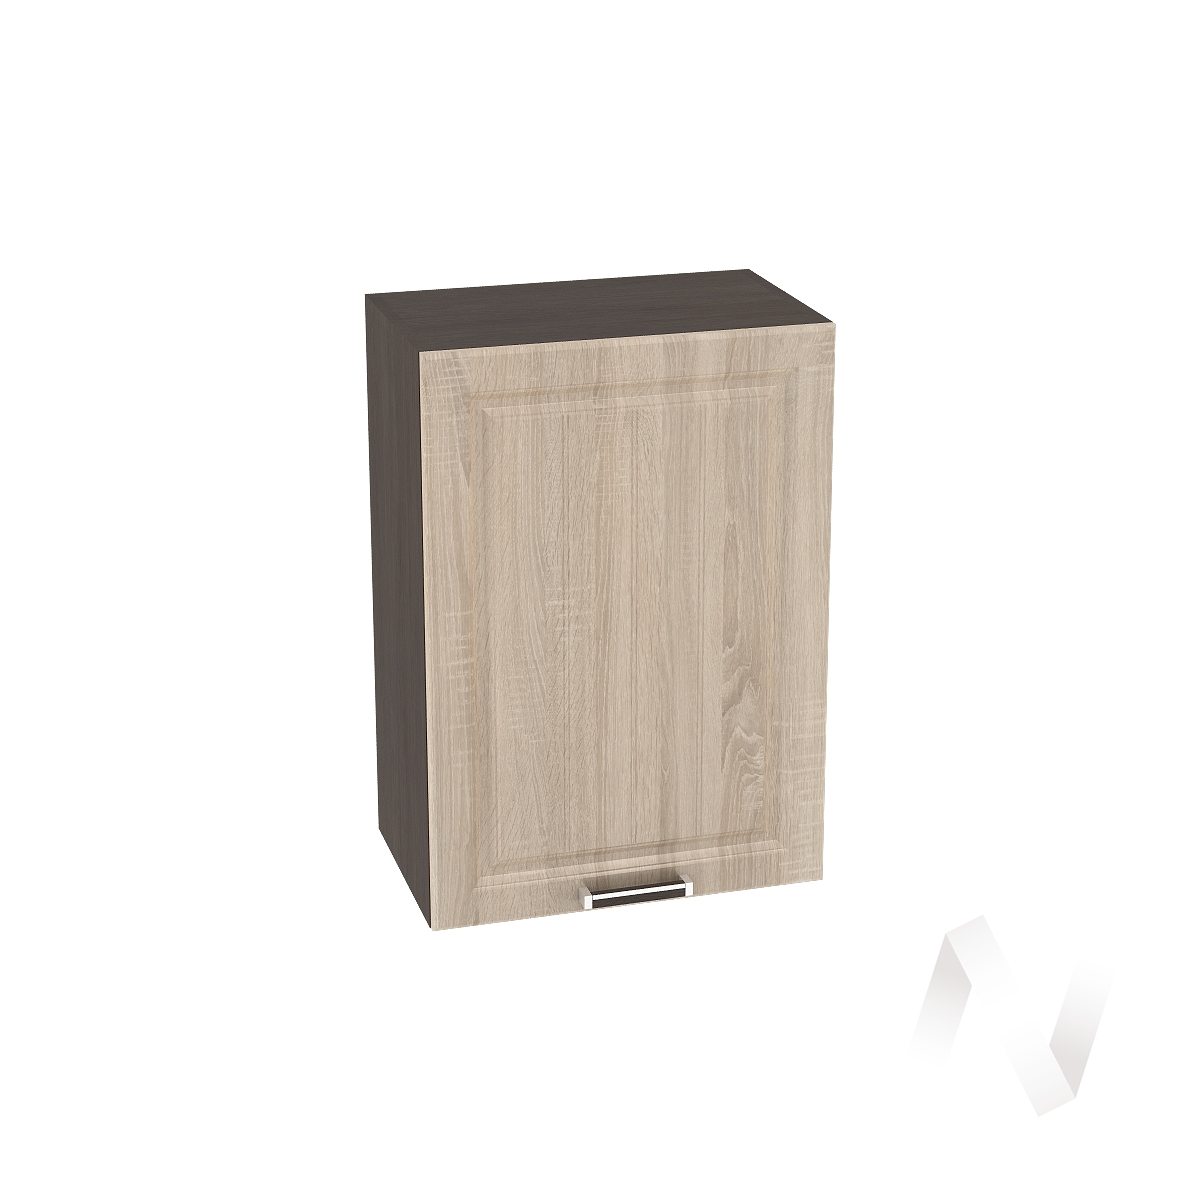 "Кухня ""Прага"": Шкаф верхний 500, ШВ 500 (дуб сонома/корпус венге)"